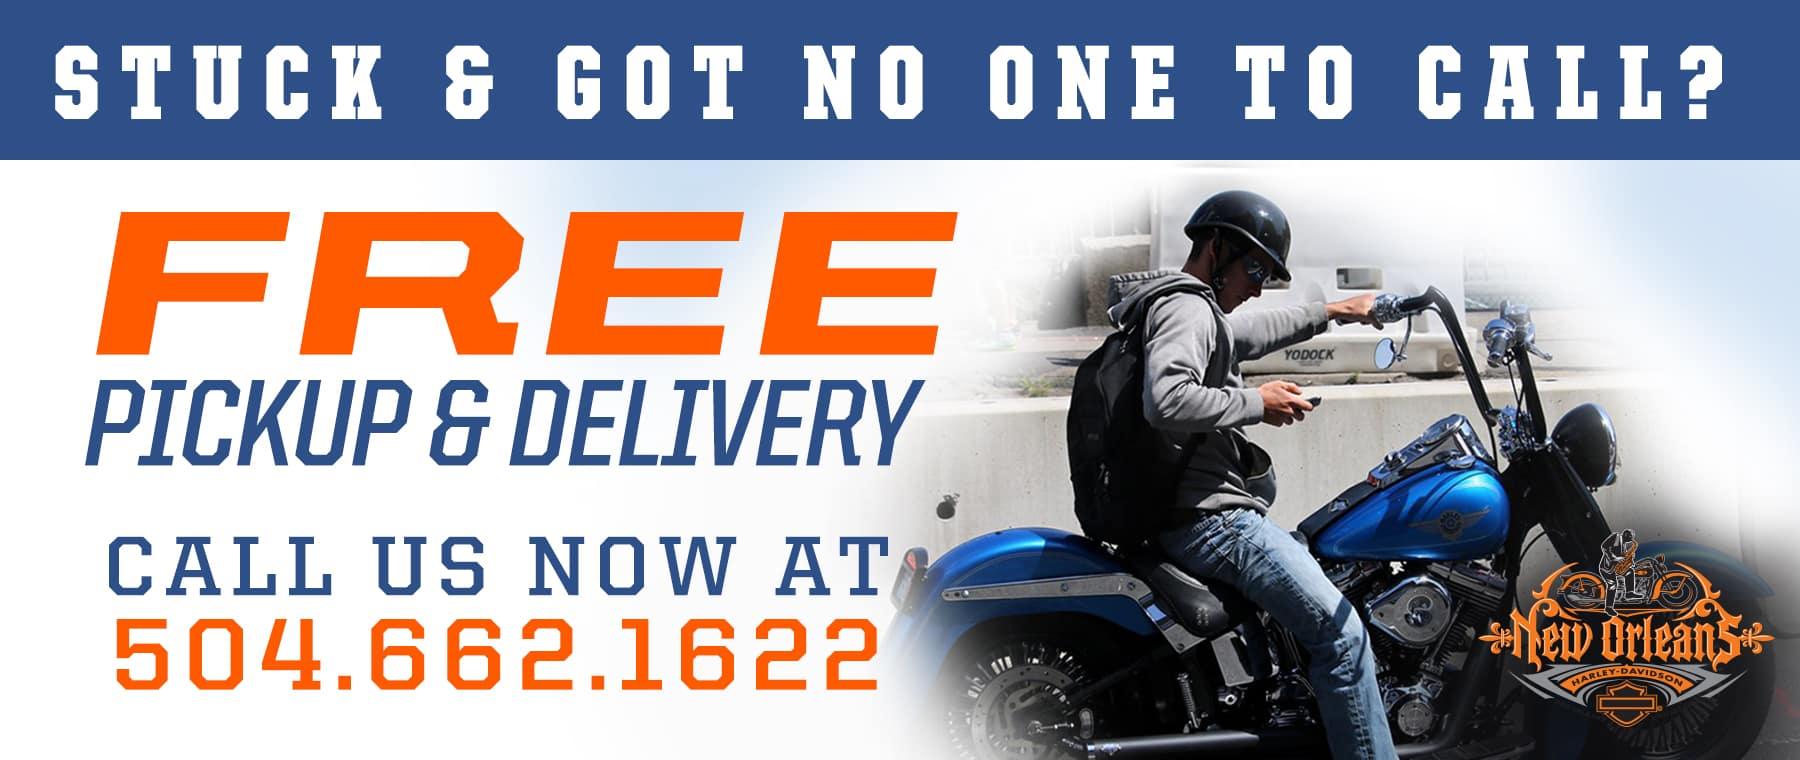 free-pickup-deliverywb